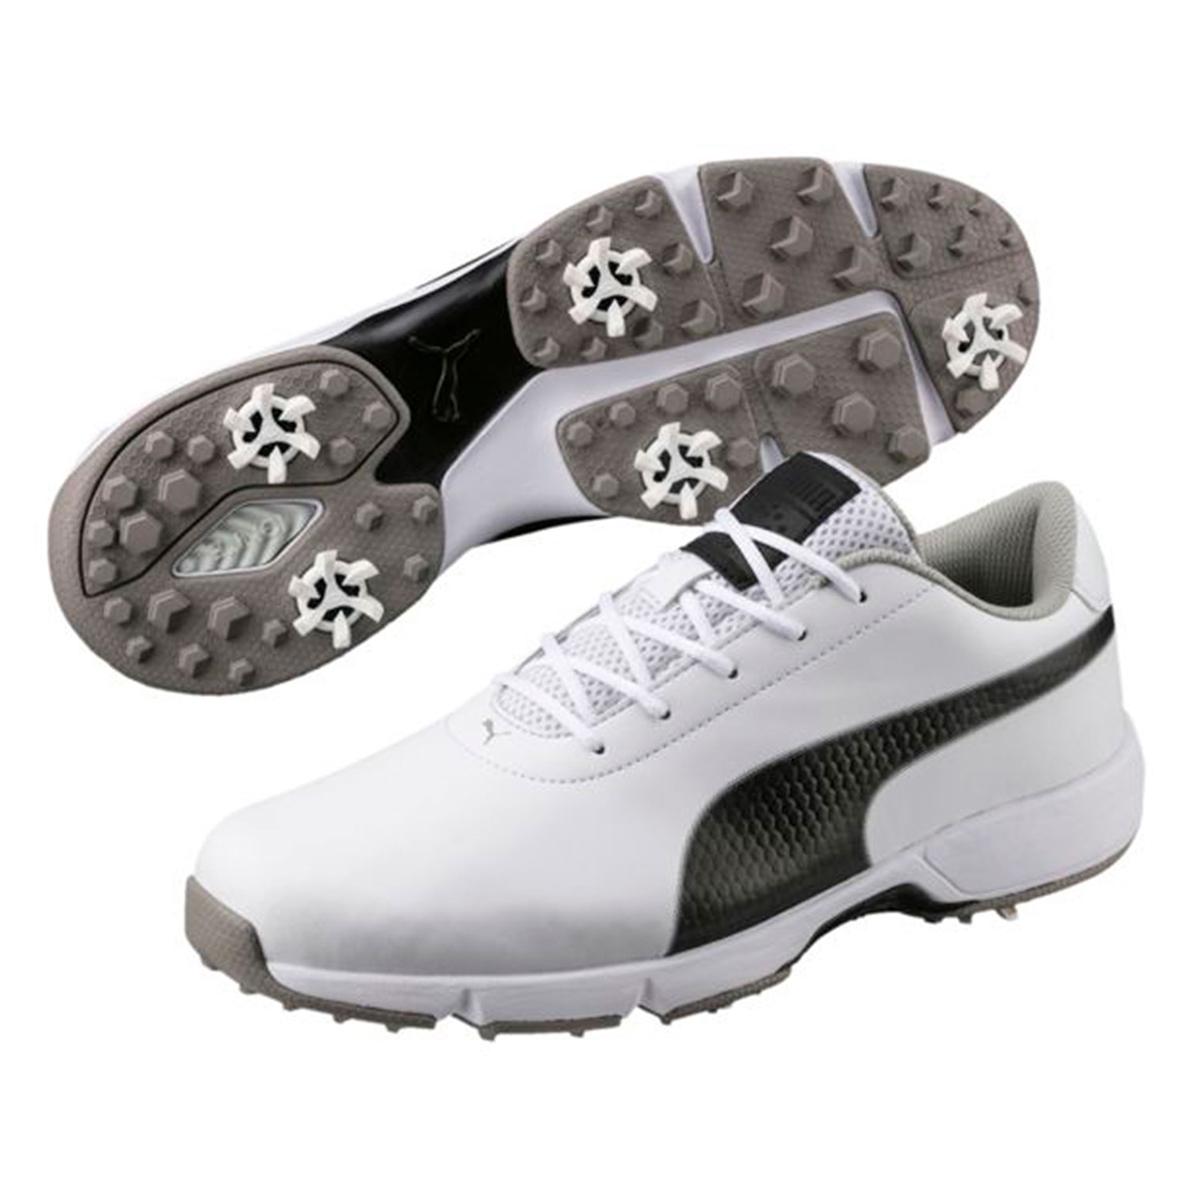 159cb45ae6c PUMA Golf Drive Cleated Classic Shoes. Puma Drive Cleated Classic S8  Puma  Drive Cleated Classic S8 ...